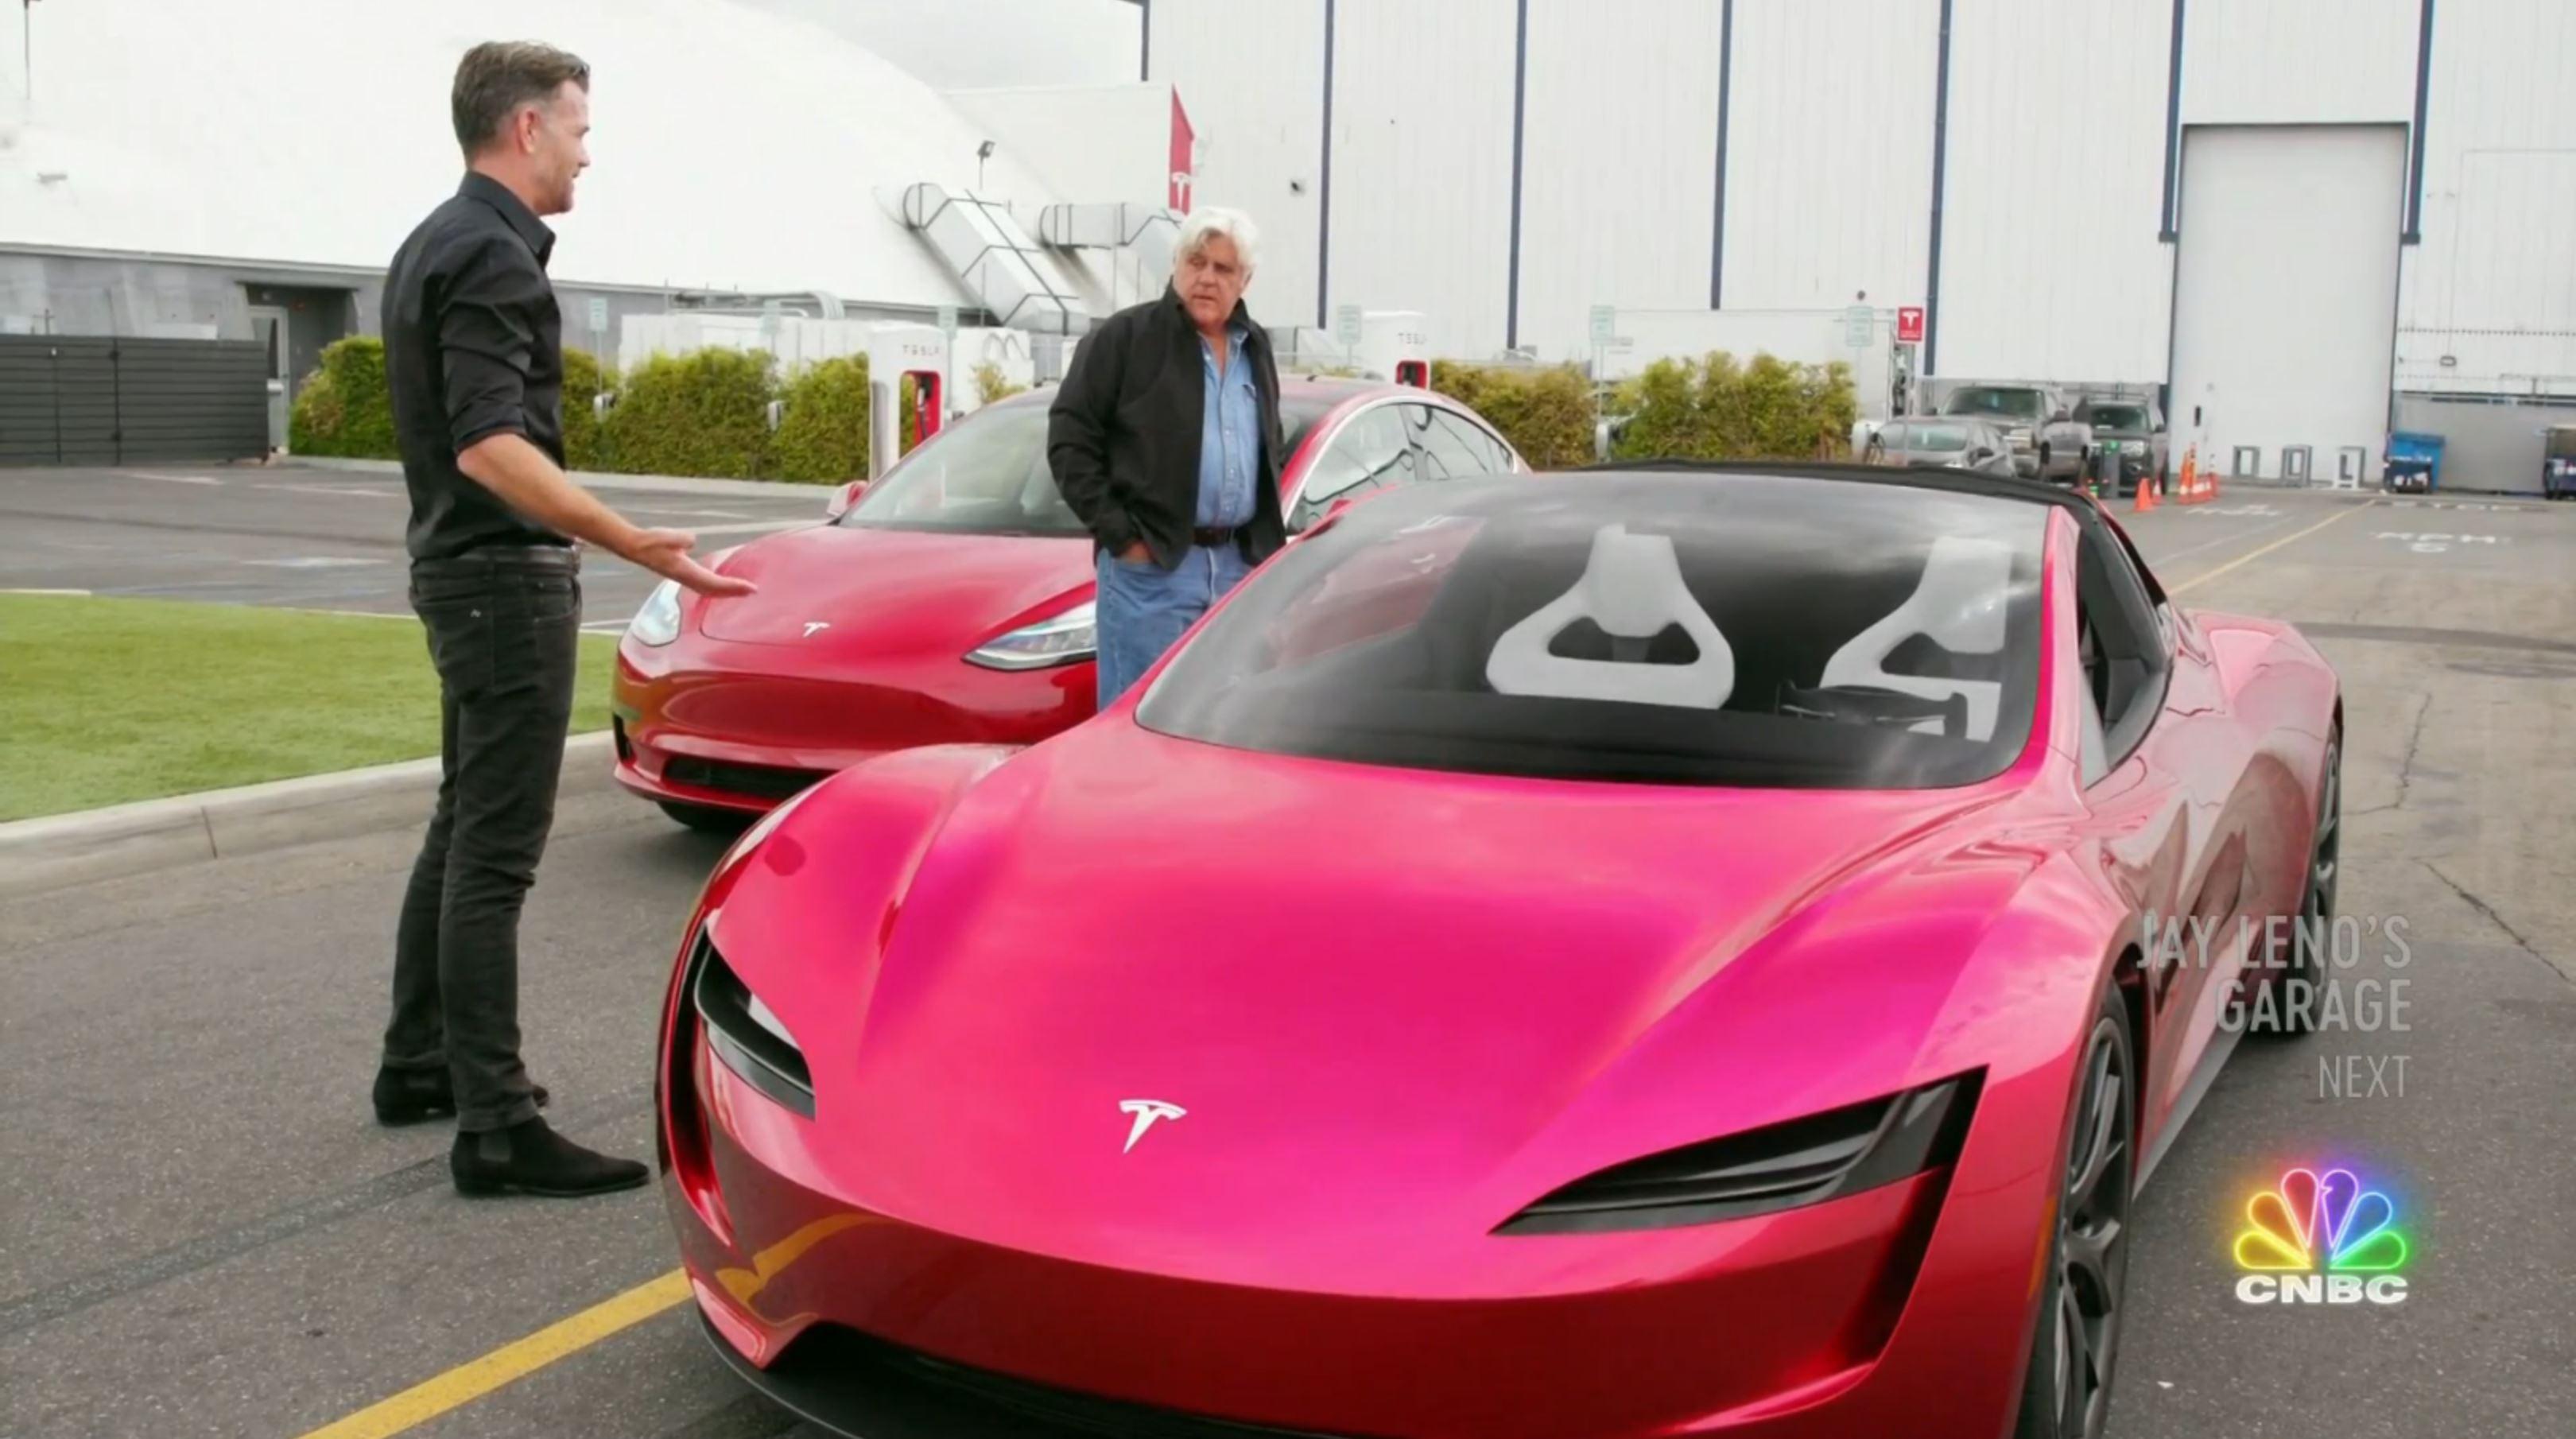 Jay Leno Tesla Franz segment (NBC) 16